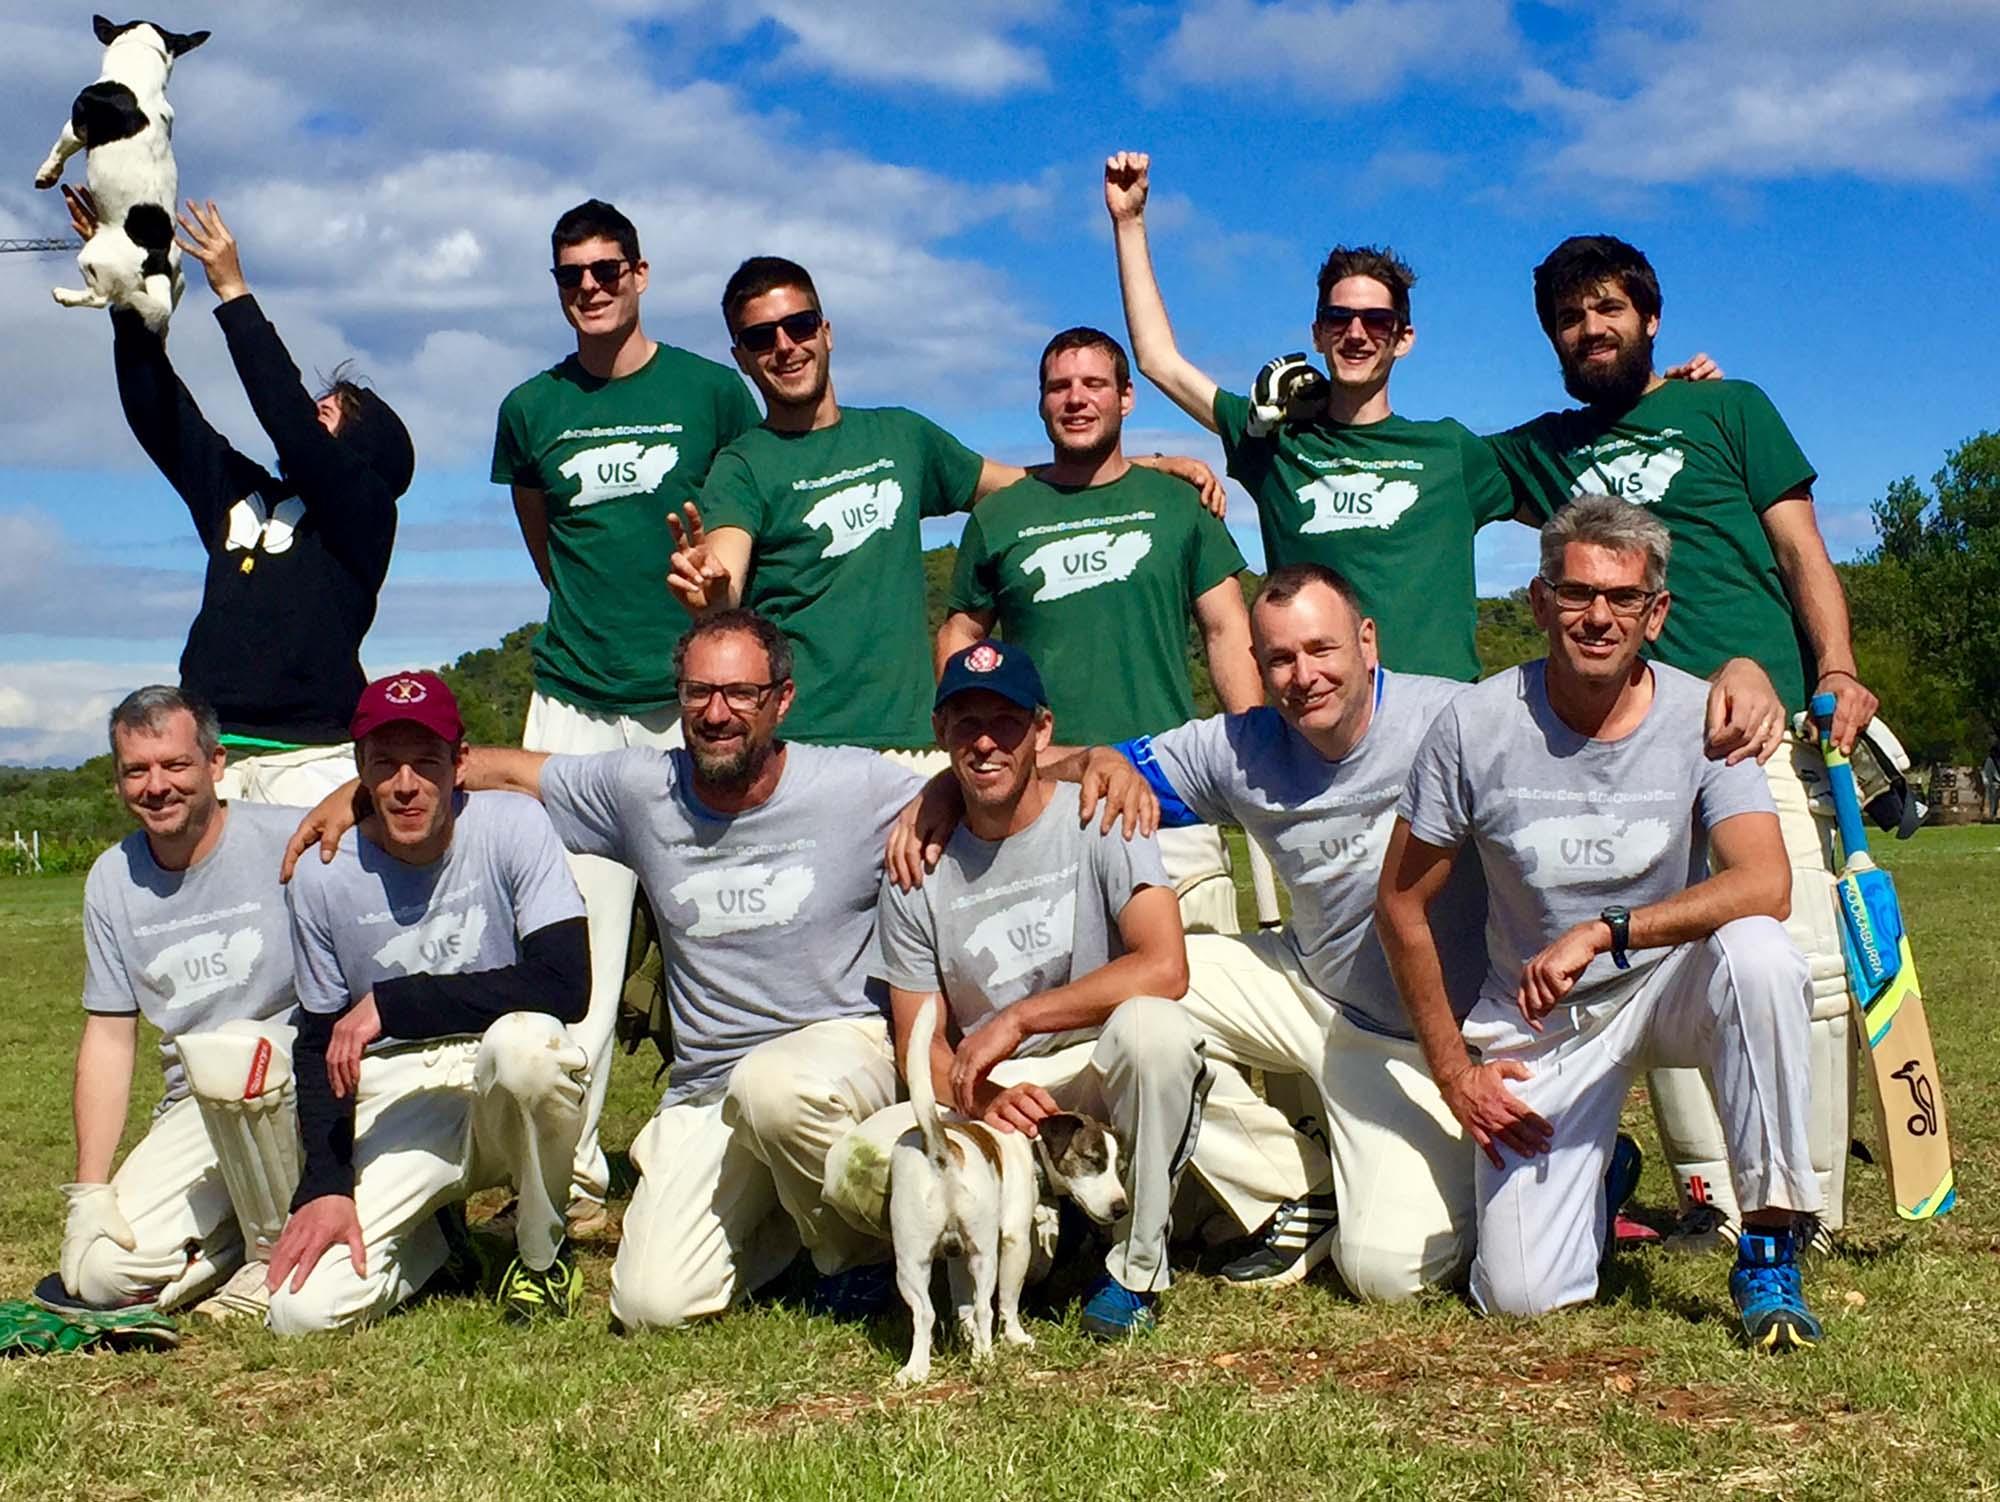 Vis island cricket team